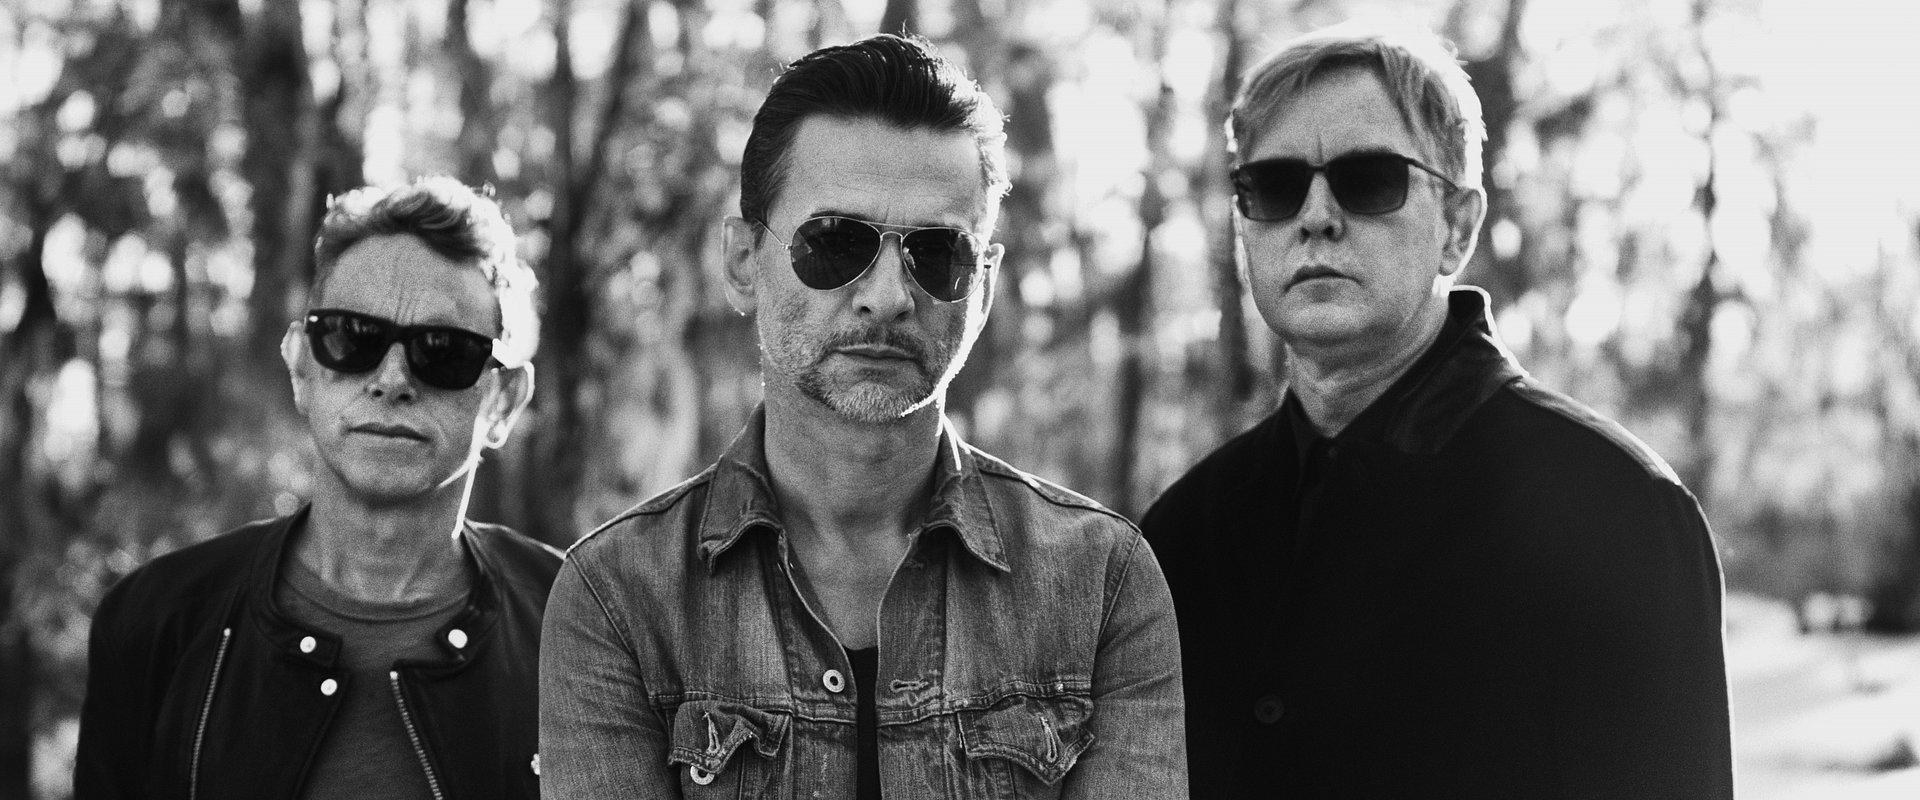 Premiera nagrania z koncertu i filmu dokumentalnego Depeche Mode na DVD wkrótce!